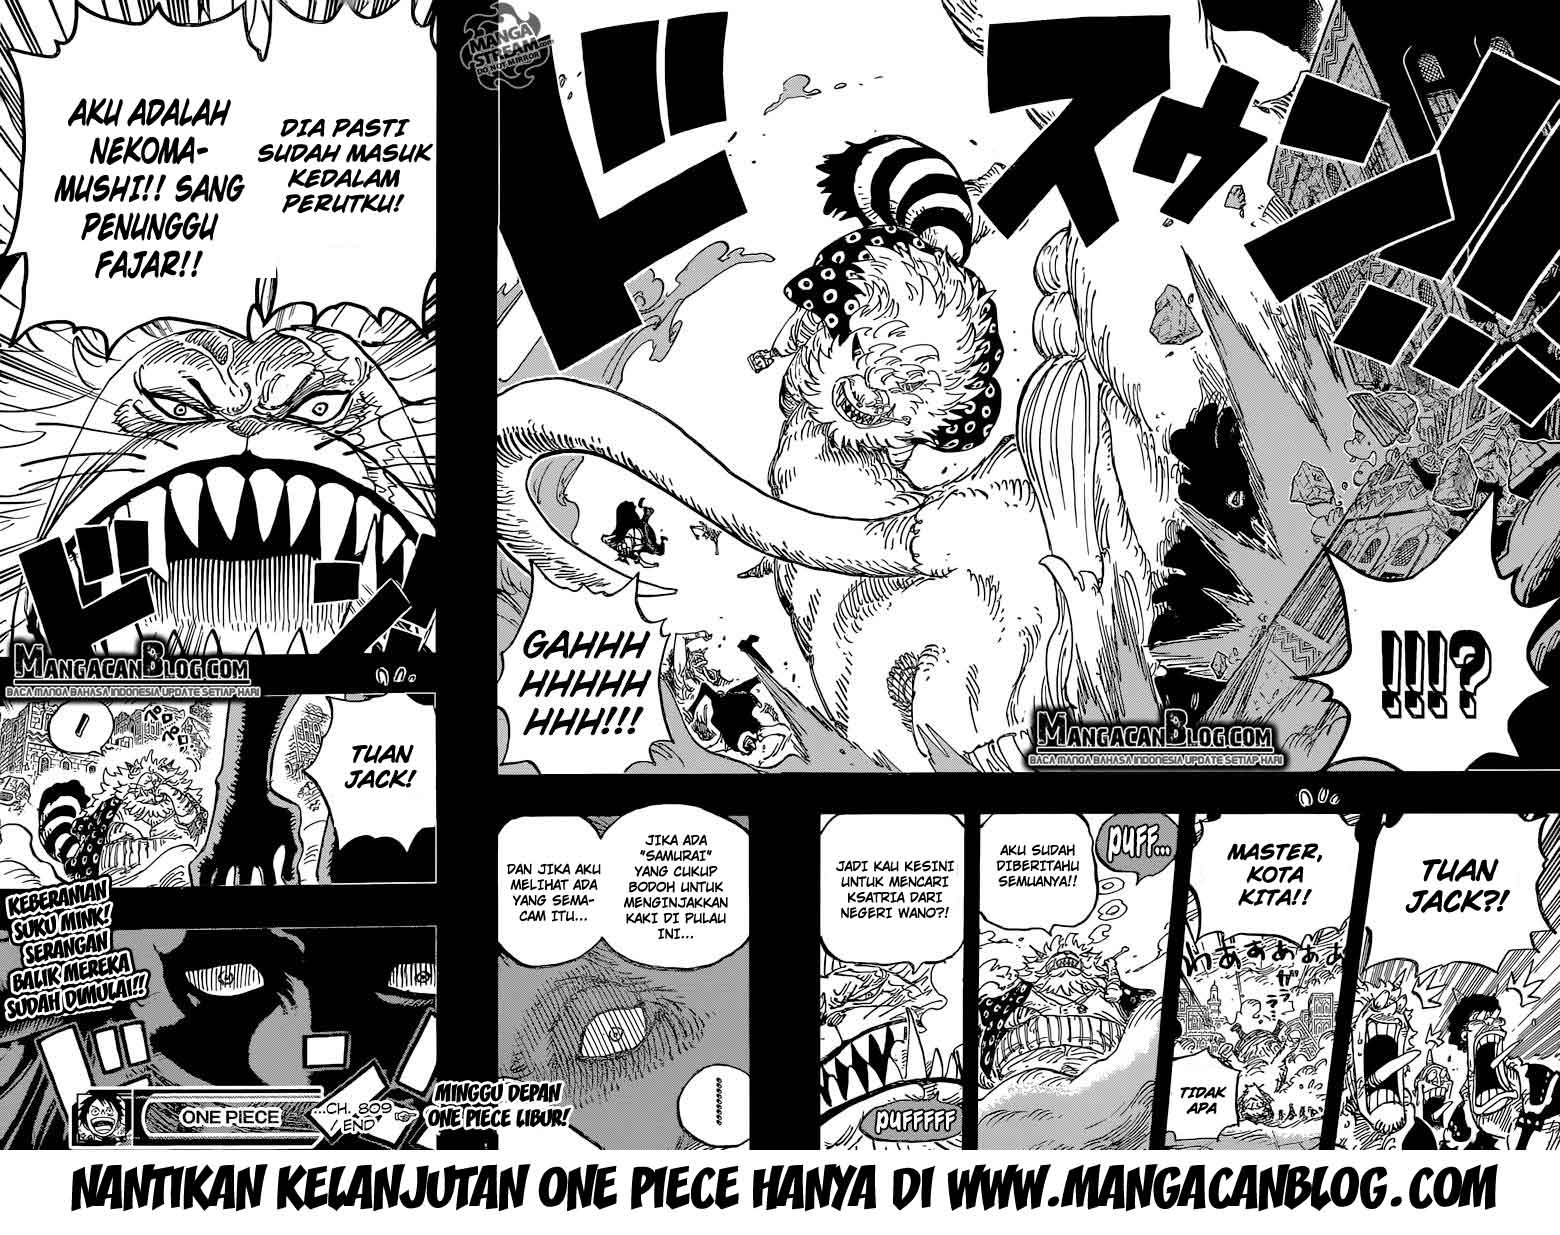 Dilarang COPAS - situs resmi www.mangacanblog.com - Komik one piece 809 - master nekomamushi 810 Indonesia one piece 809 - master nekomamushi Terbaru 19|Baca Manga Komik Indonesia|Mangacan